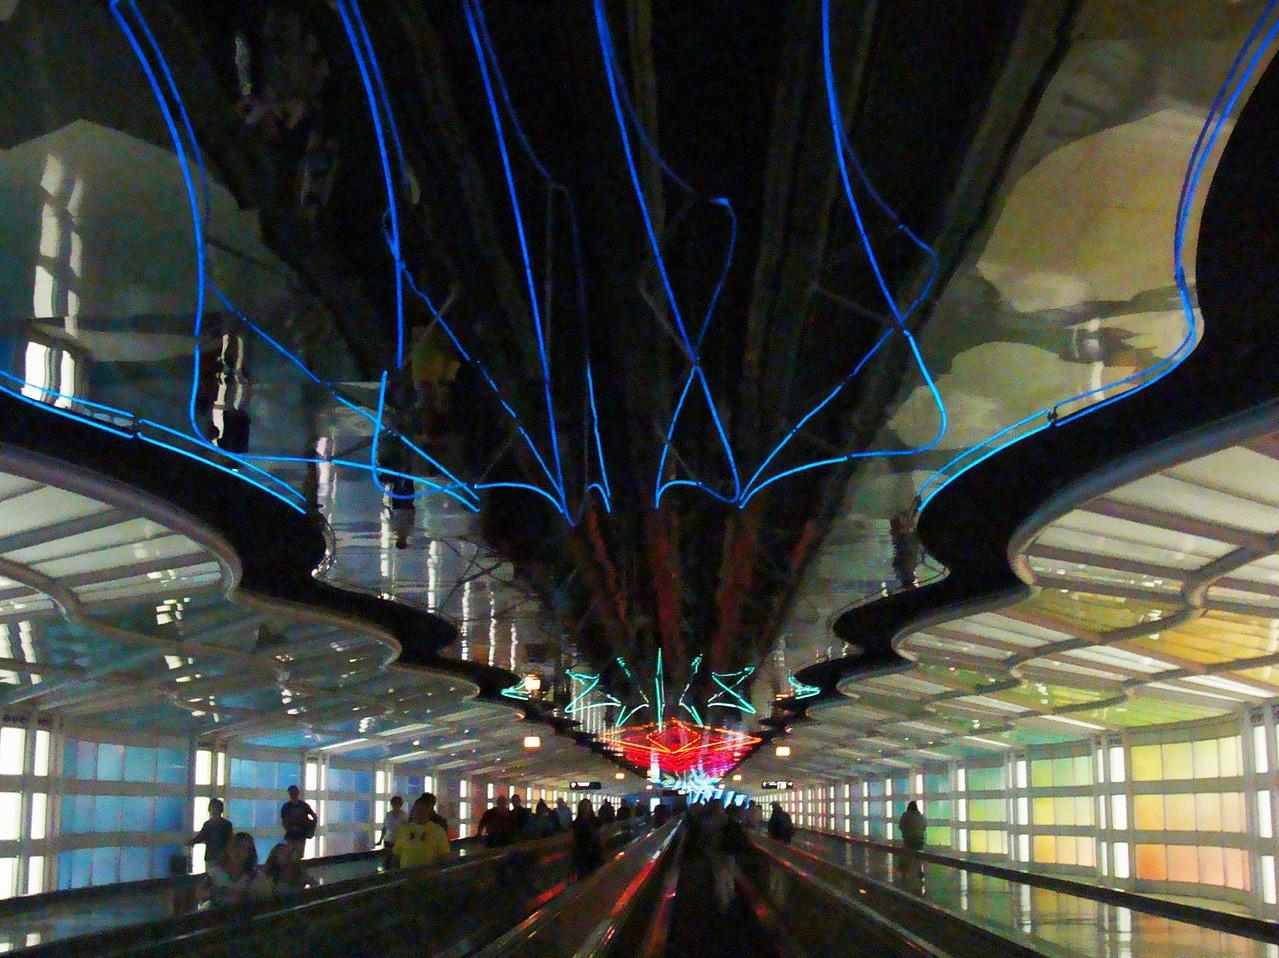 Terminal B to C Light and Sound Show